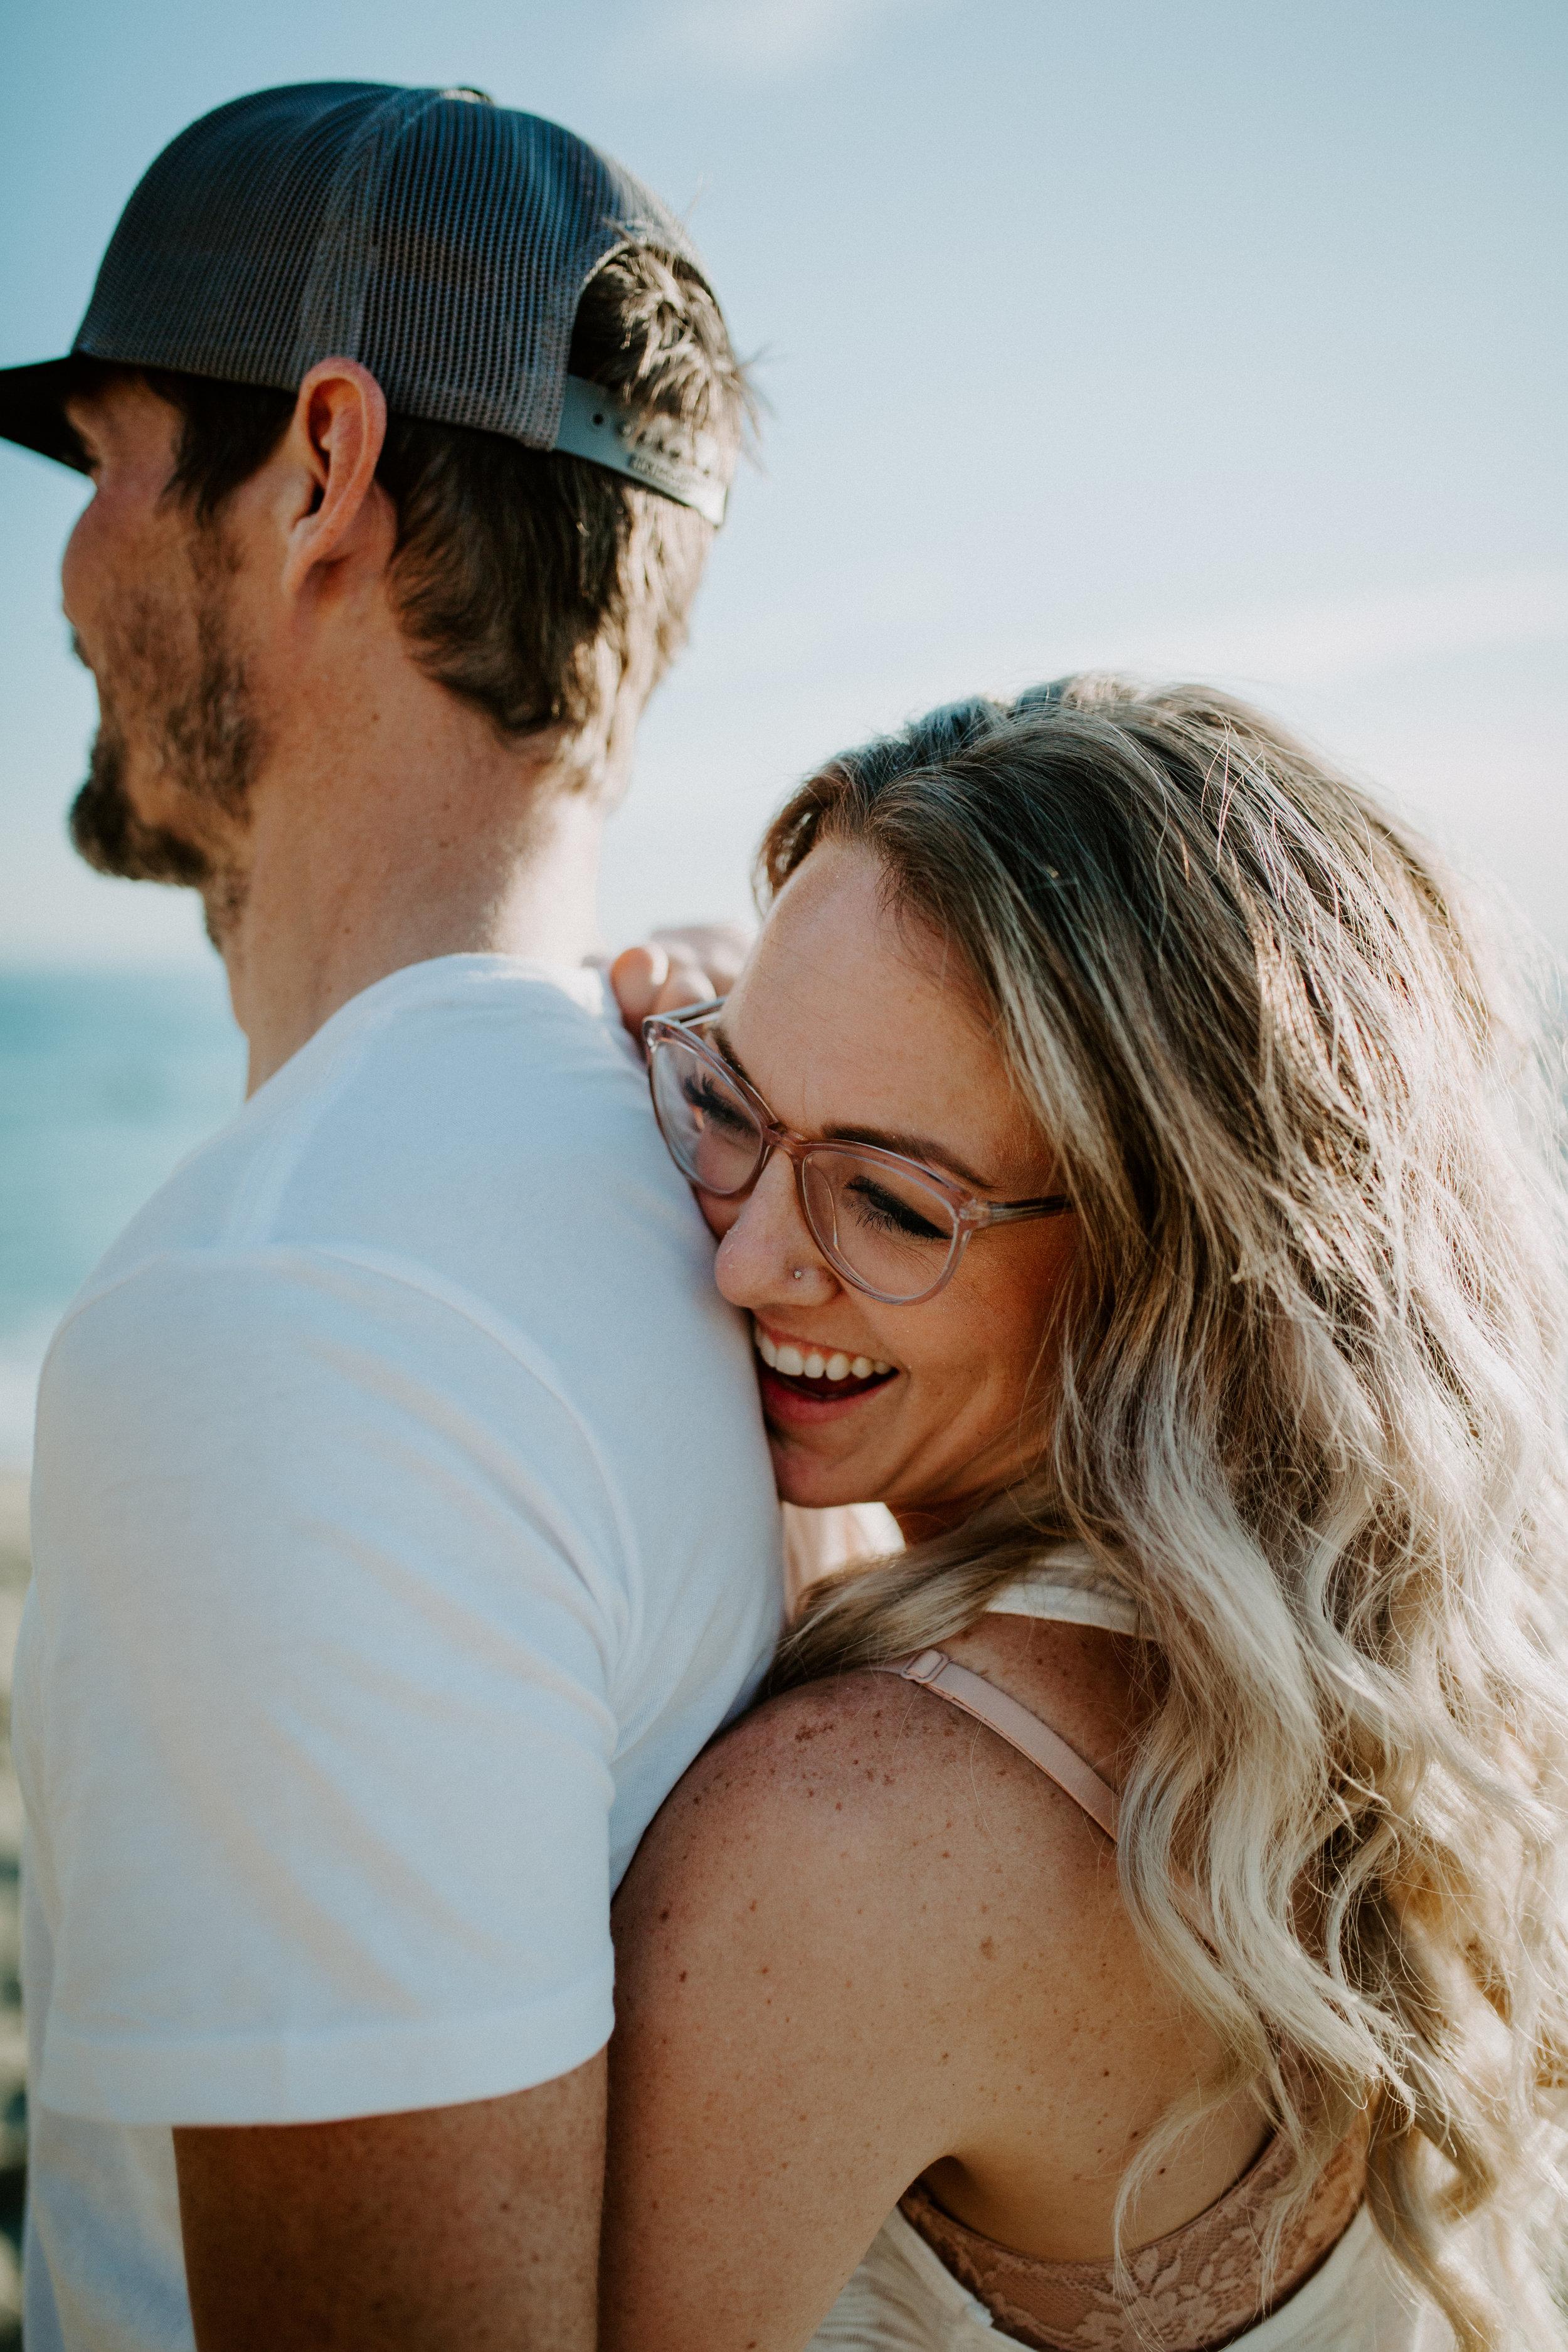 laguna_beach_couple_photoshoot_mae_tyler_california_november_maia_chloe_photo